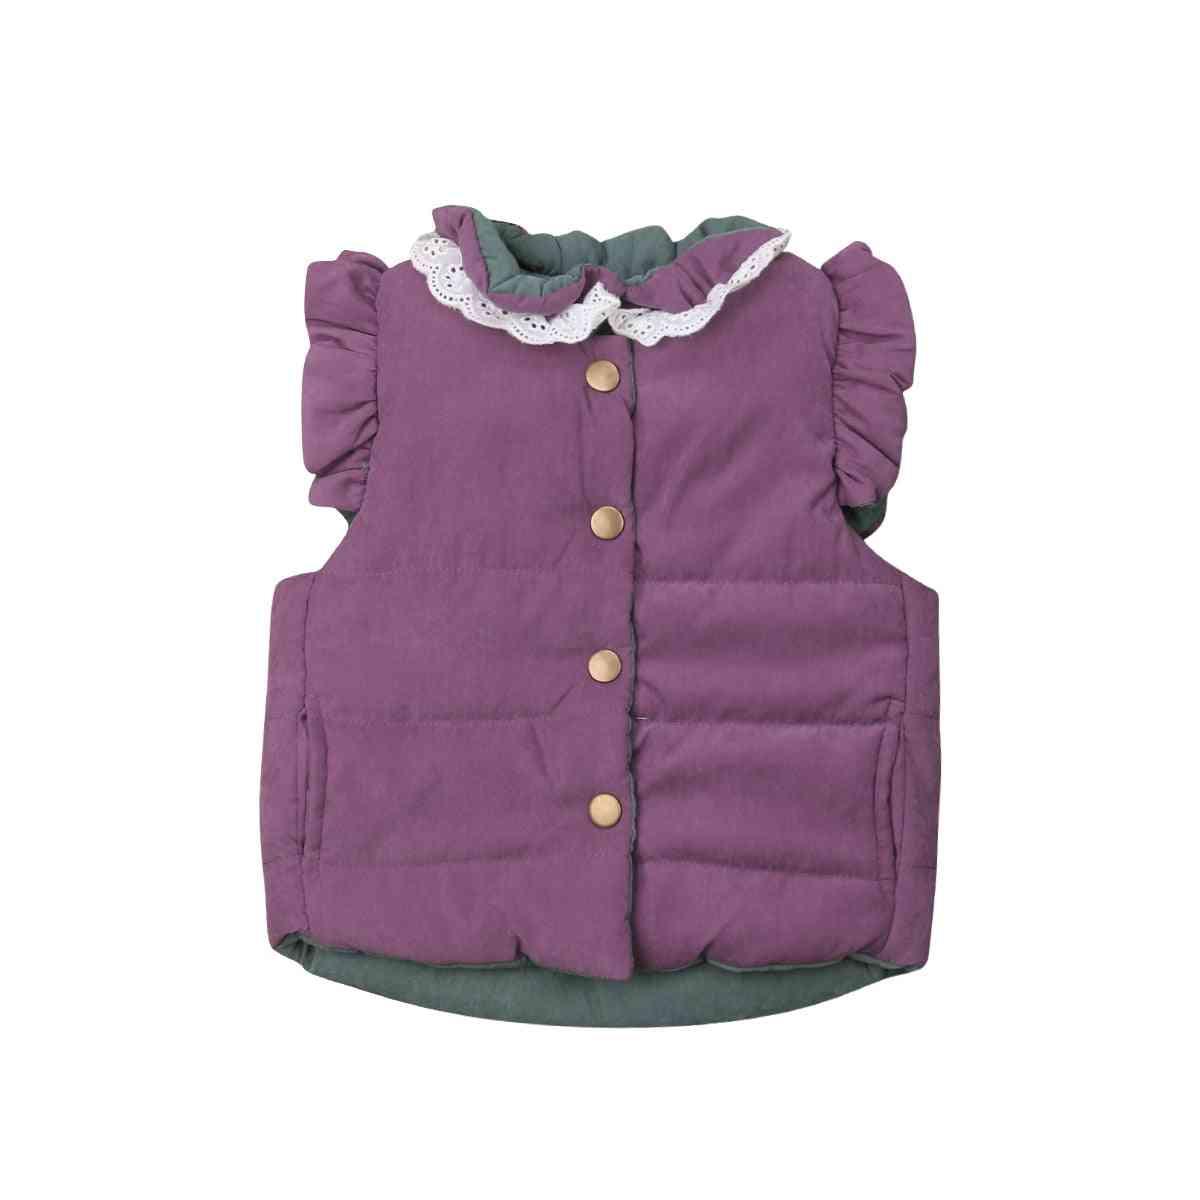 Baby, Winter Coat Jacket, Sleeveless Waistcoat Outerwear